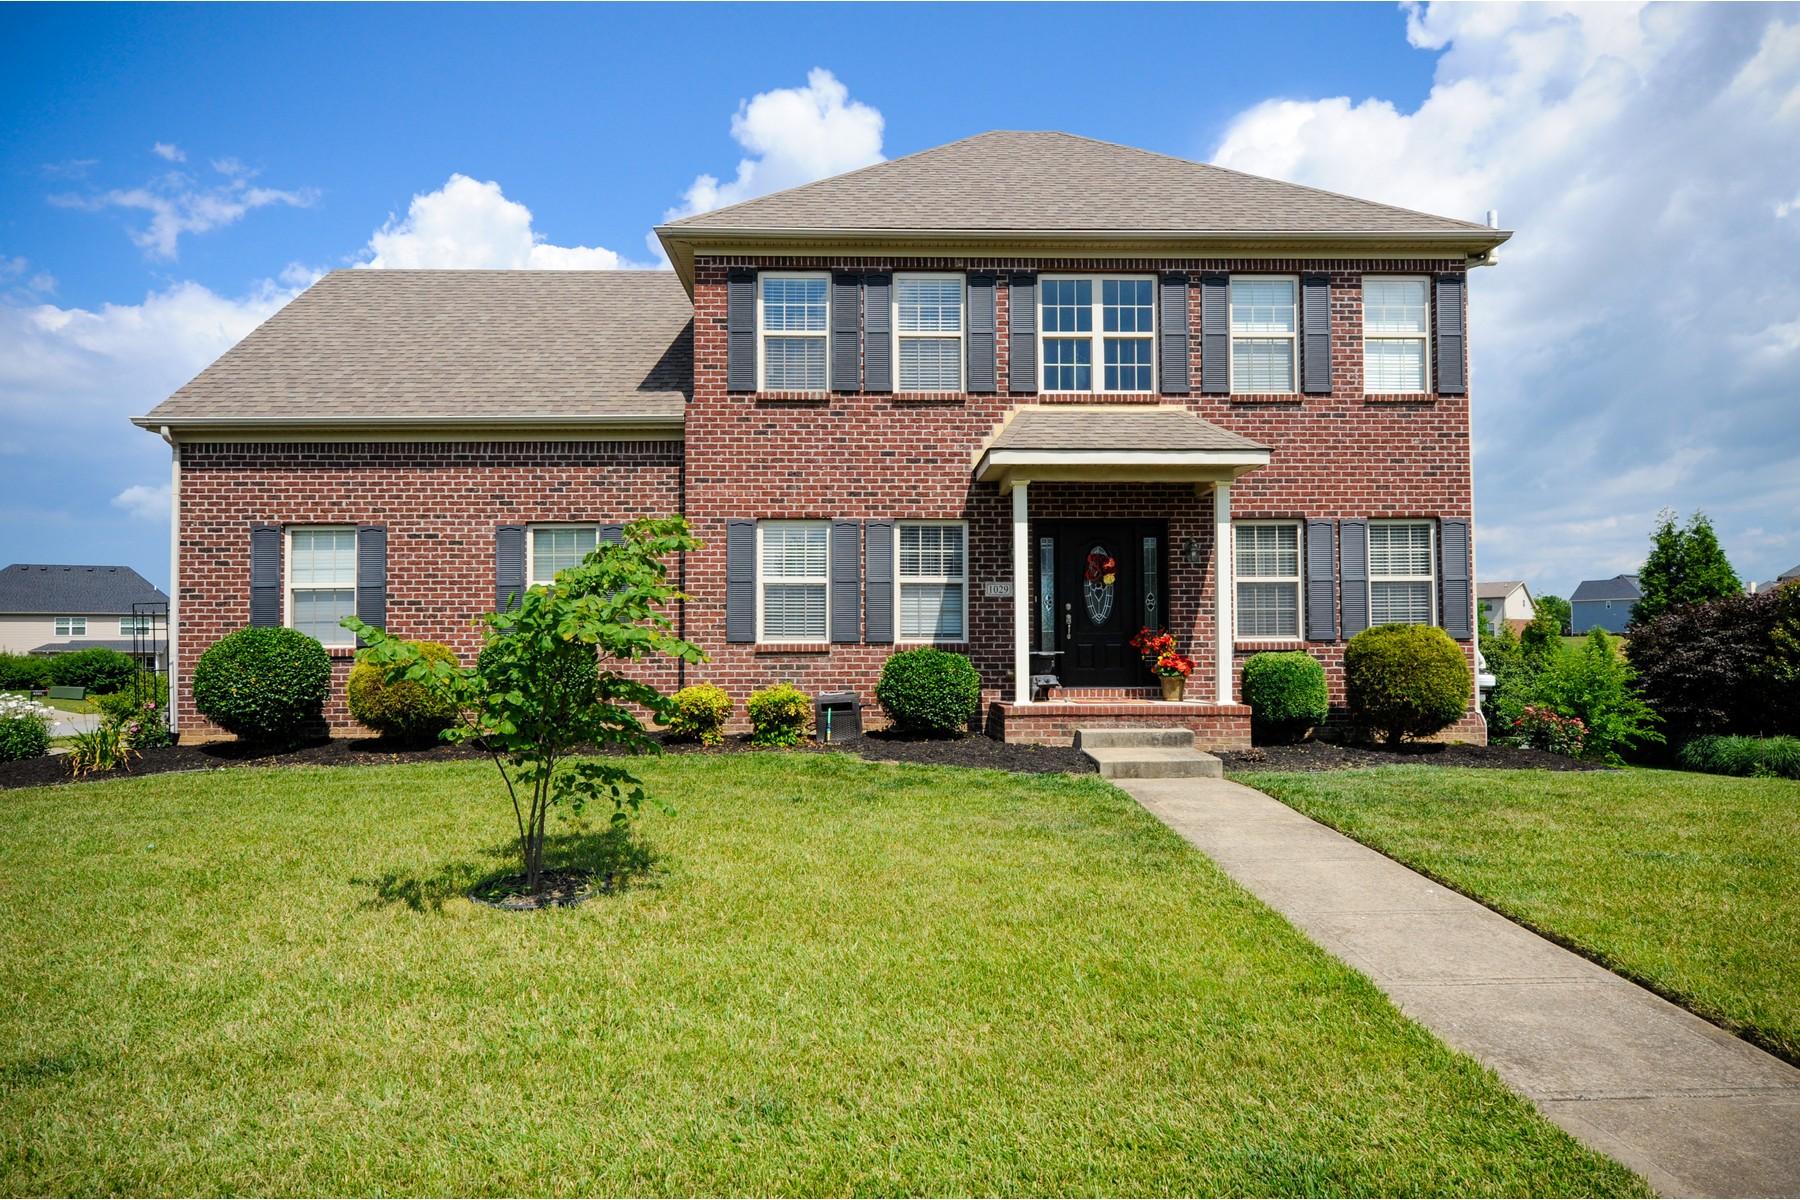 Casa Unifamiliar por un Venta en 1029 Cedar Ridge 1029 Cedar Ridge Ln Versailles, Kentucky, 40383 Estados Unidos